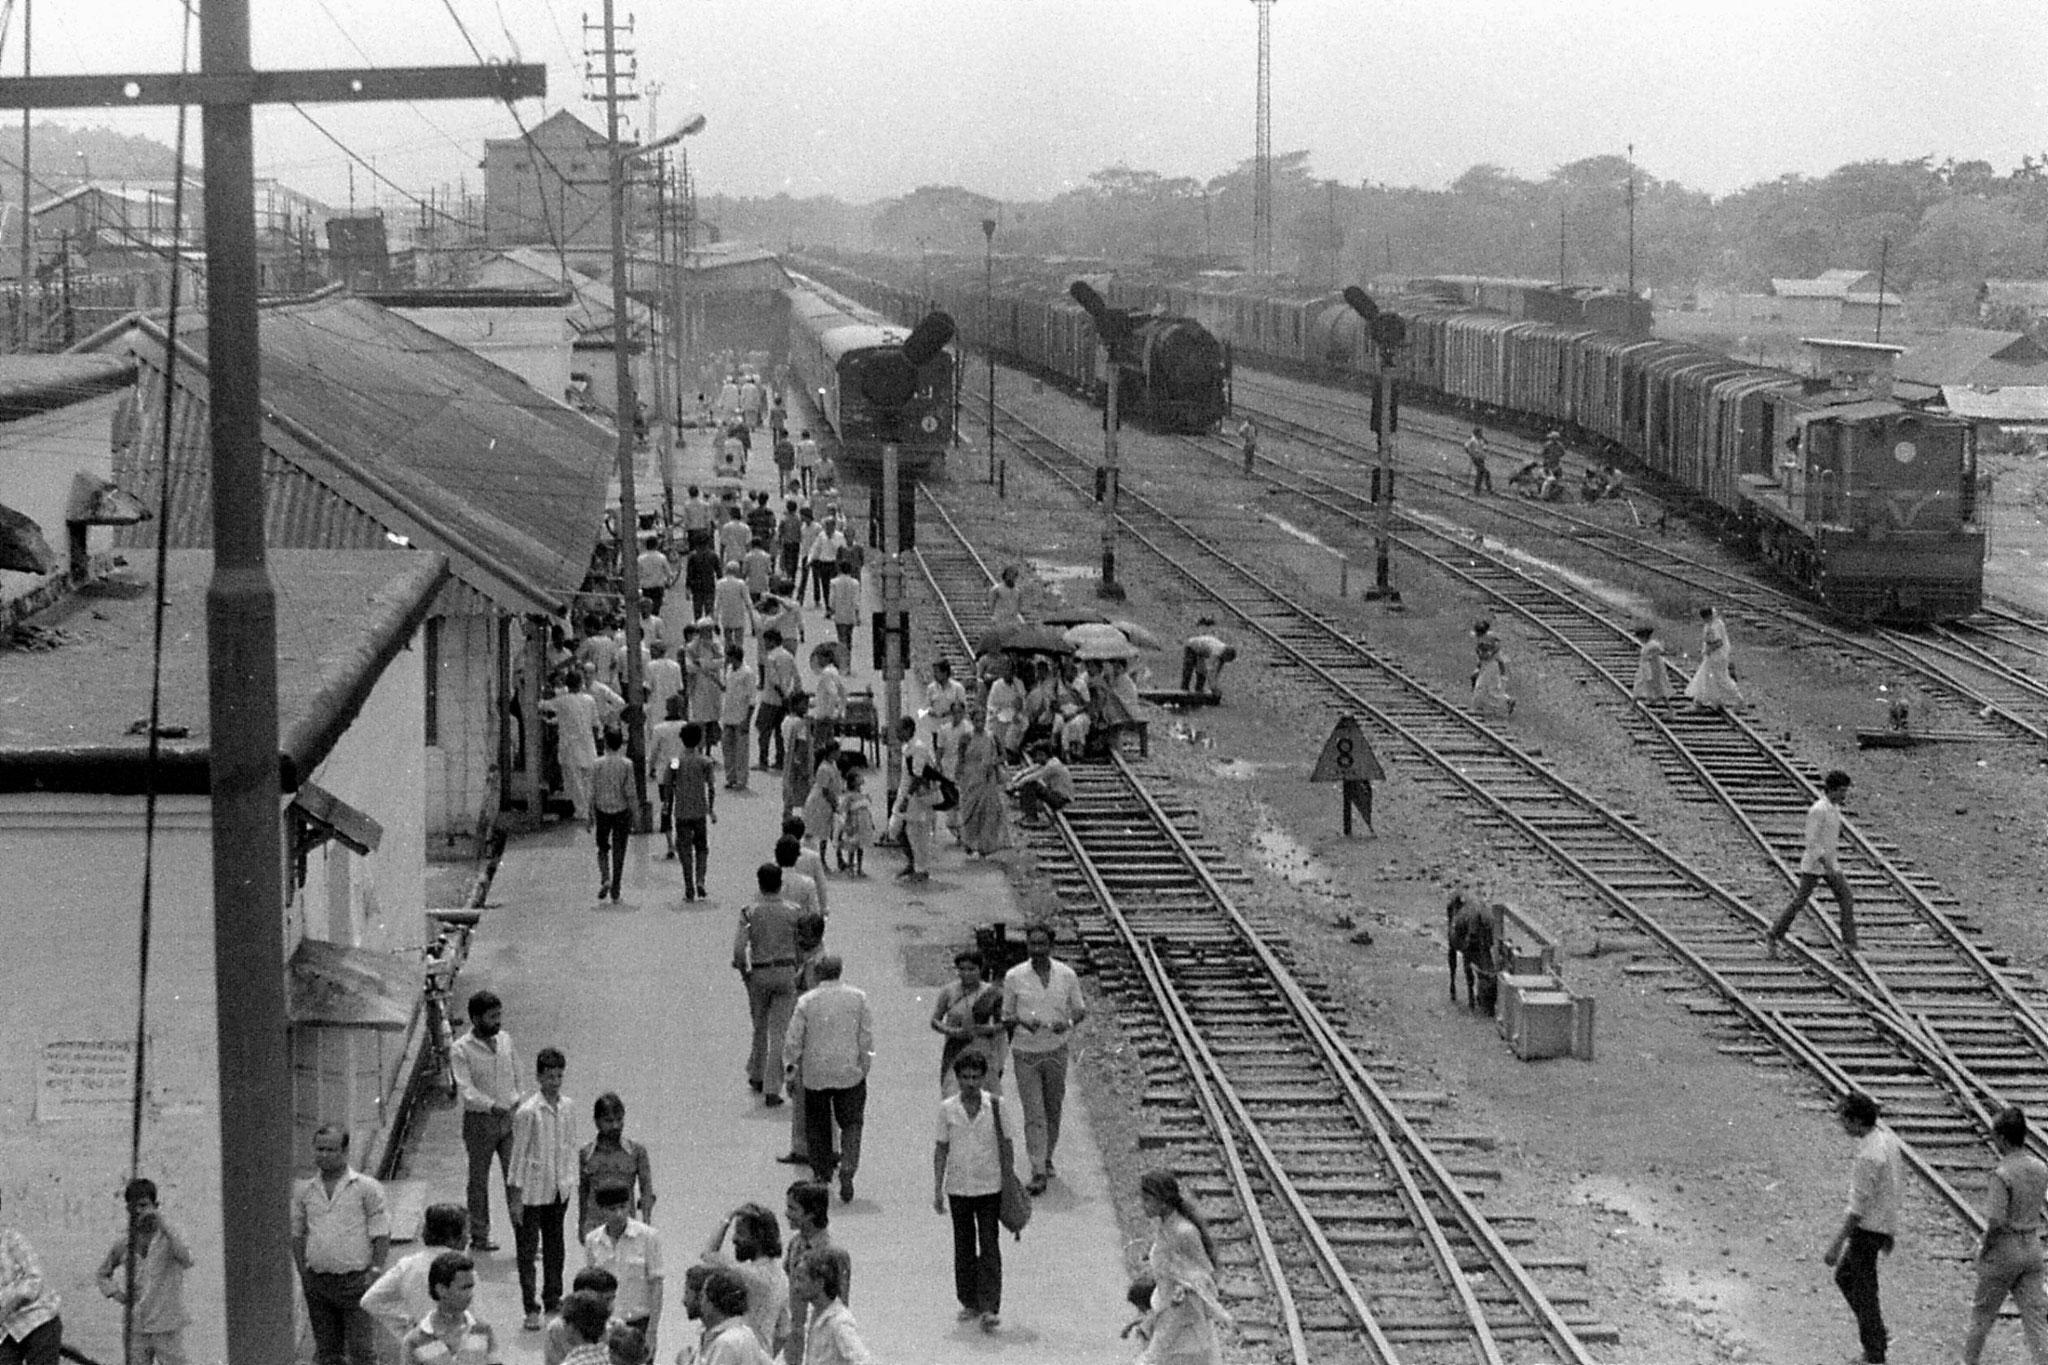 12/4/1990: 36: women strikers blocking train